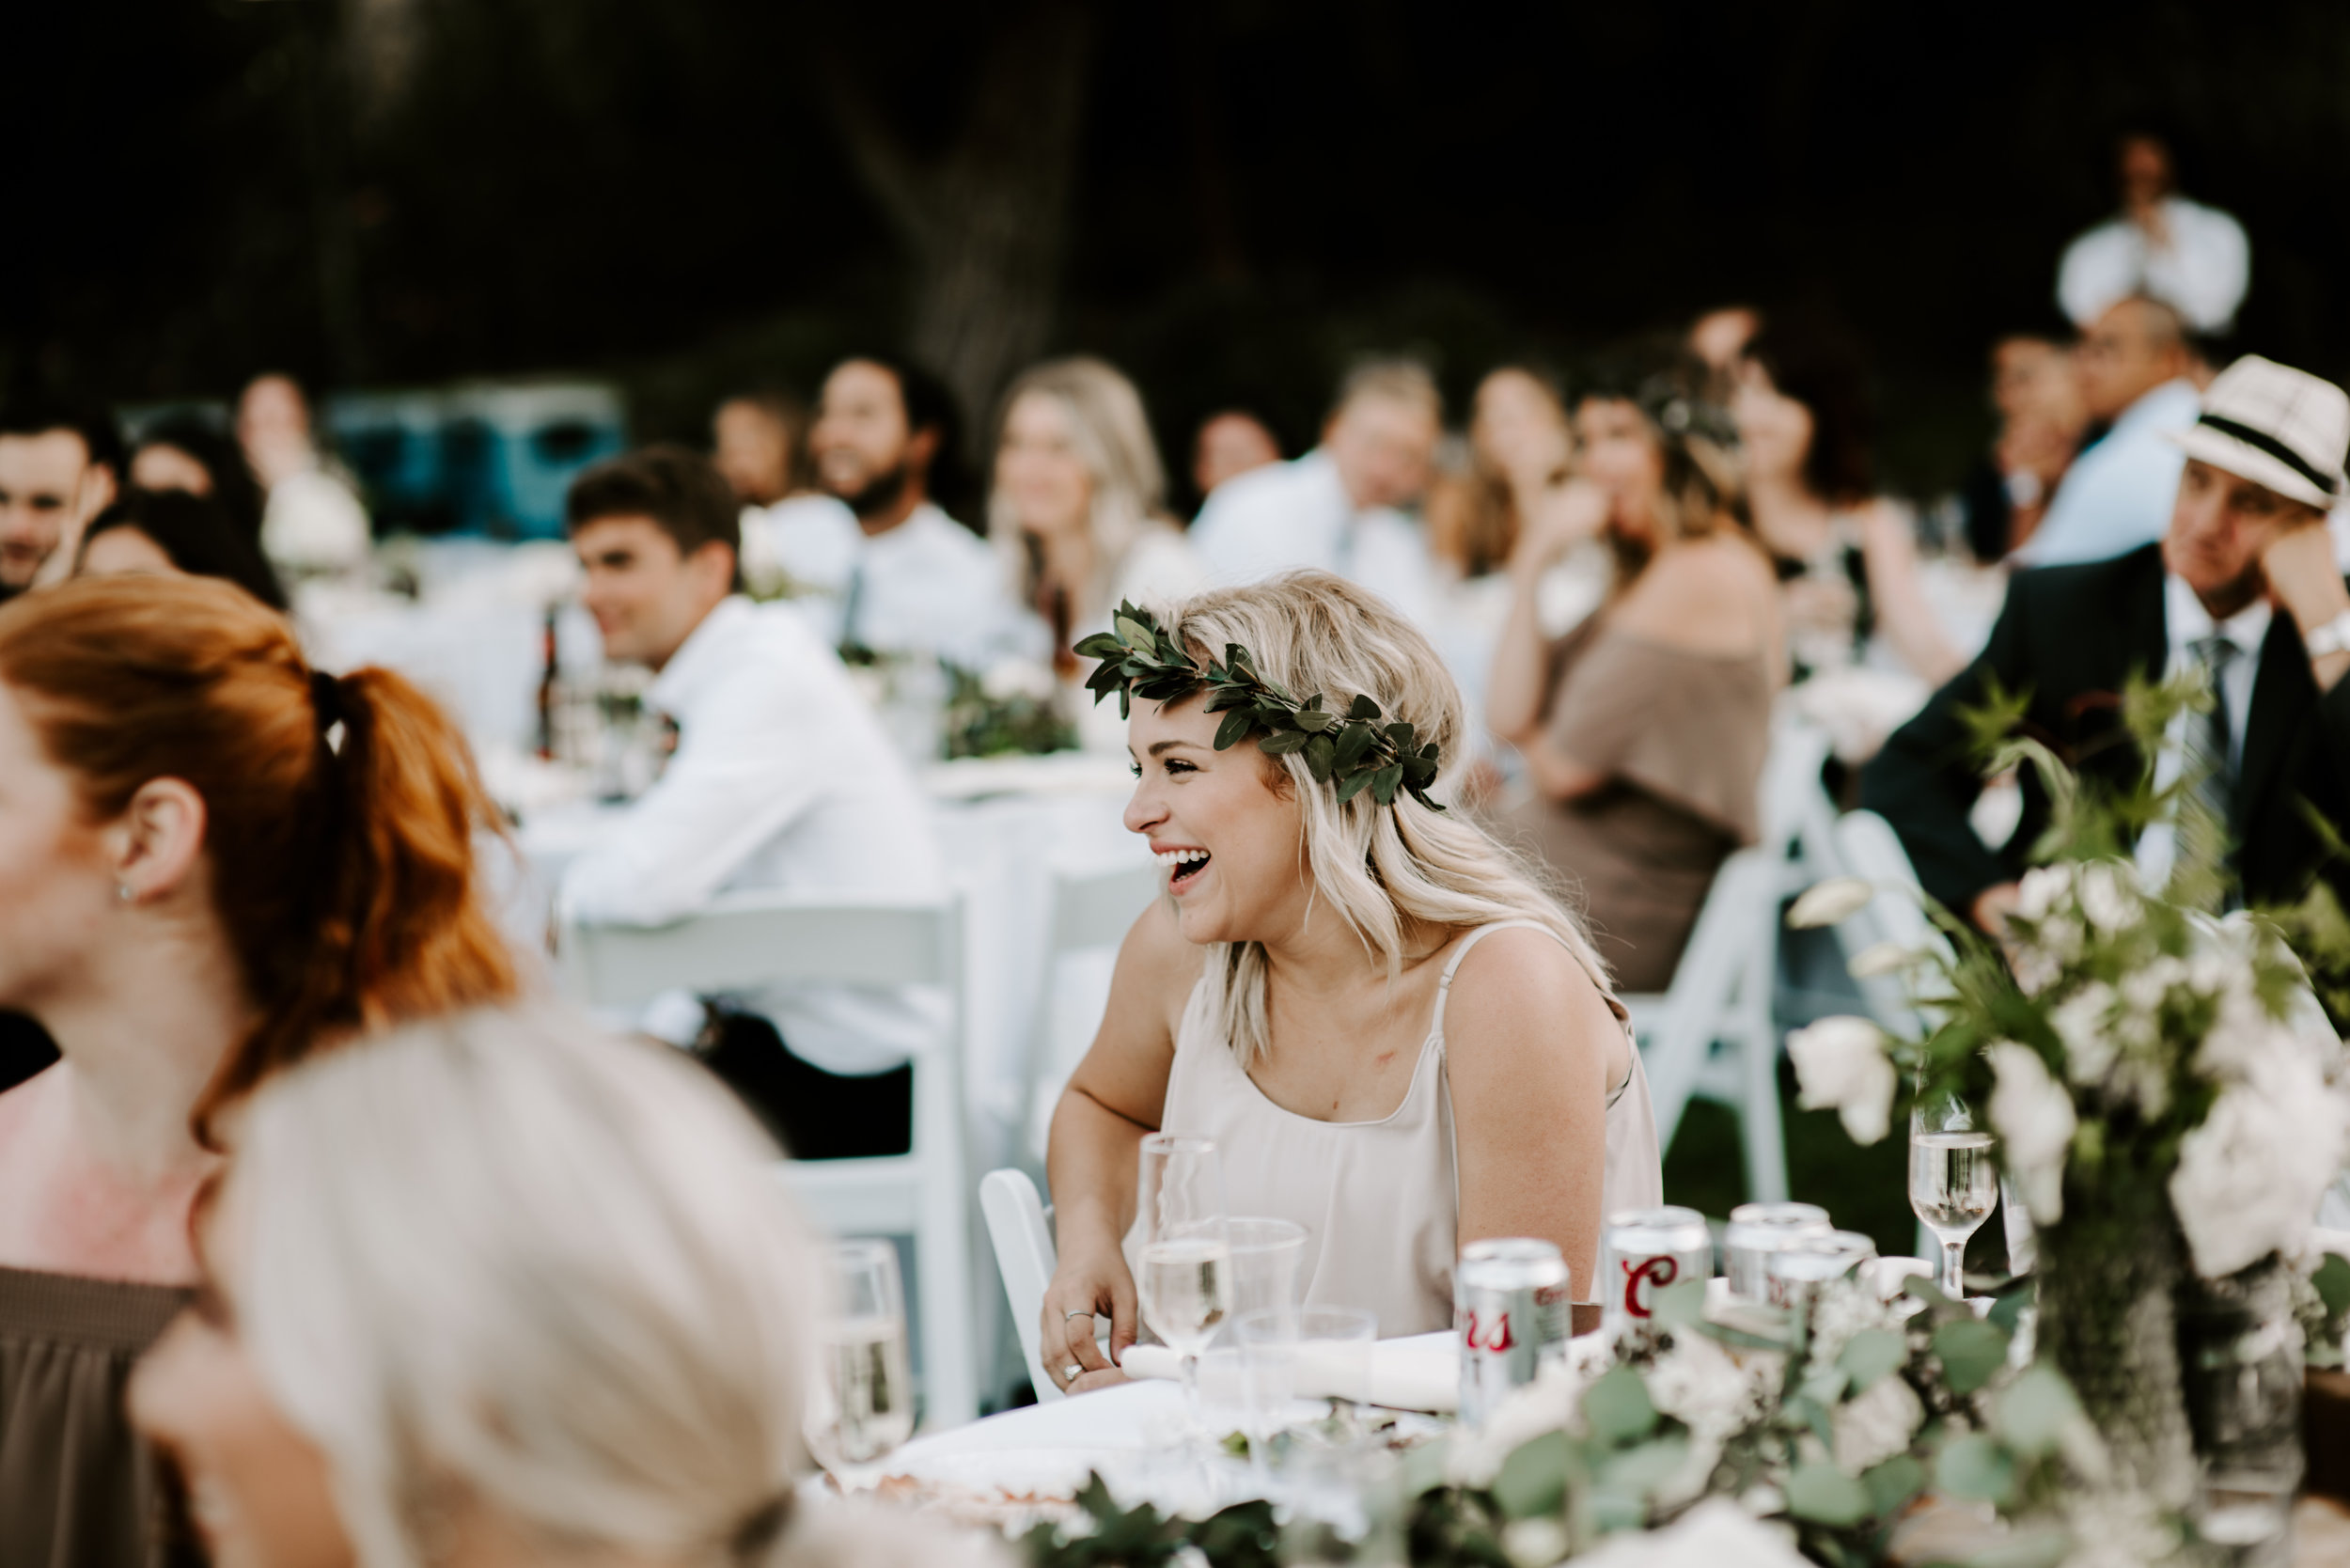 kate+zack_wedding_secludedgardenestate_temecula_madisonrylee_1200.jpg